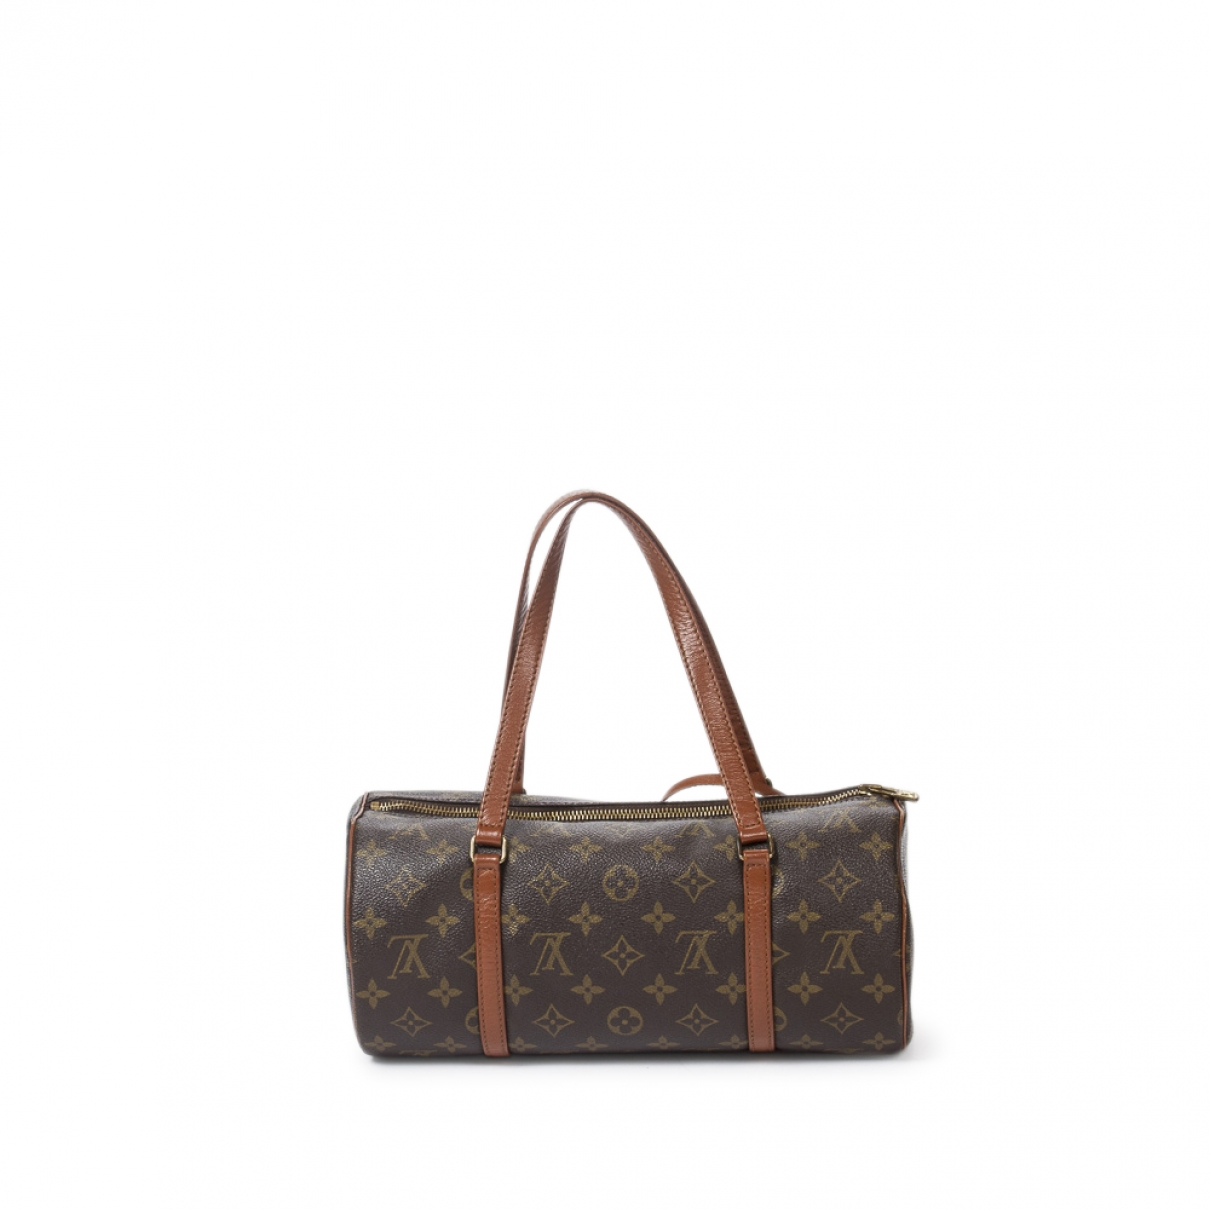 Louis Vuitton - Sac a main Papillon pour femme en coton - marron